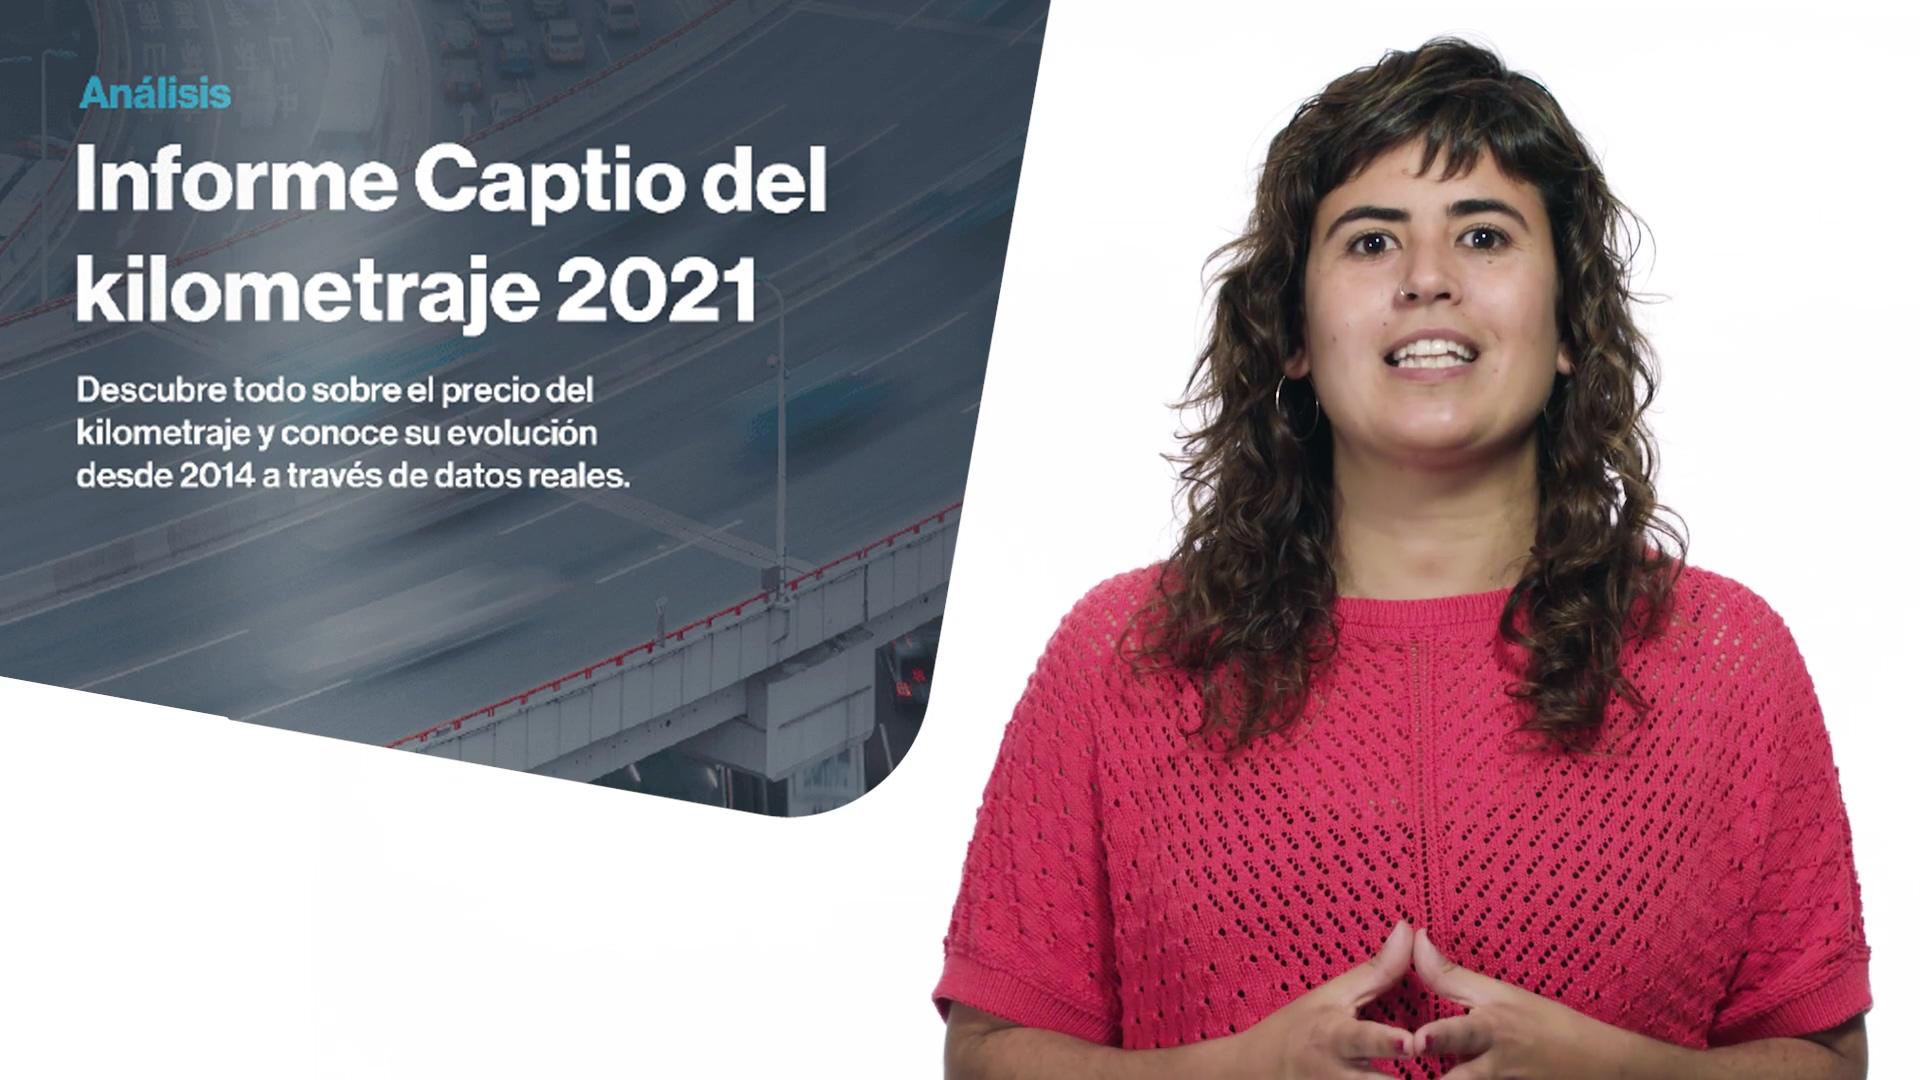 Informe_del_Kilometraje_2021